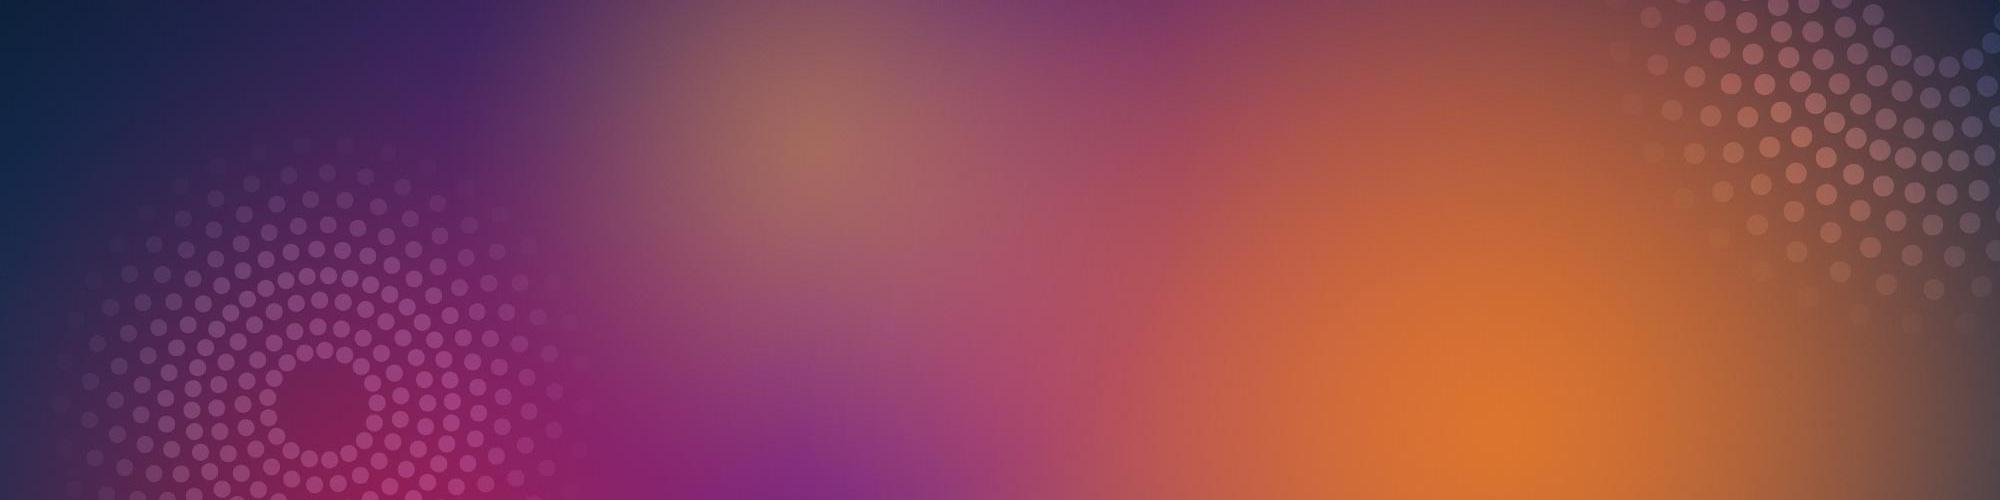 color pop orange plum radiance